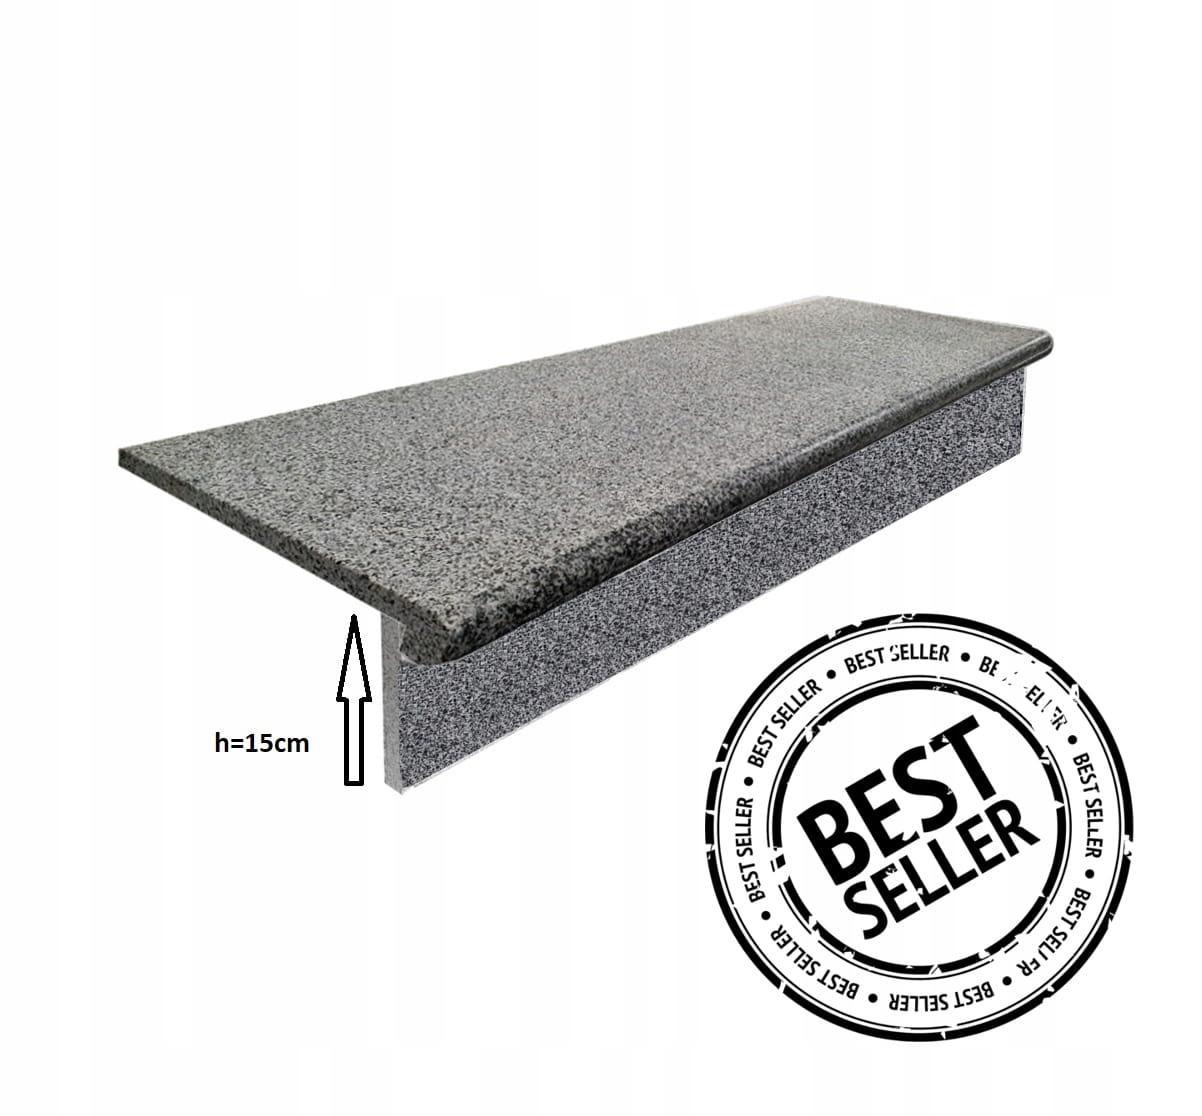 Комплект ступеней + ступенька Granite G654 100x35x2